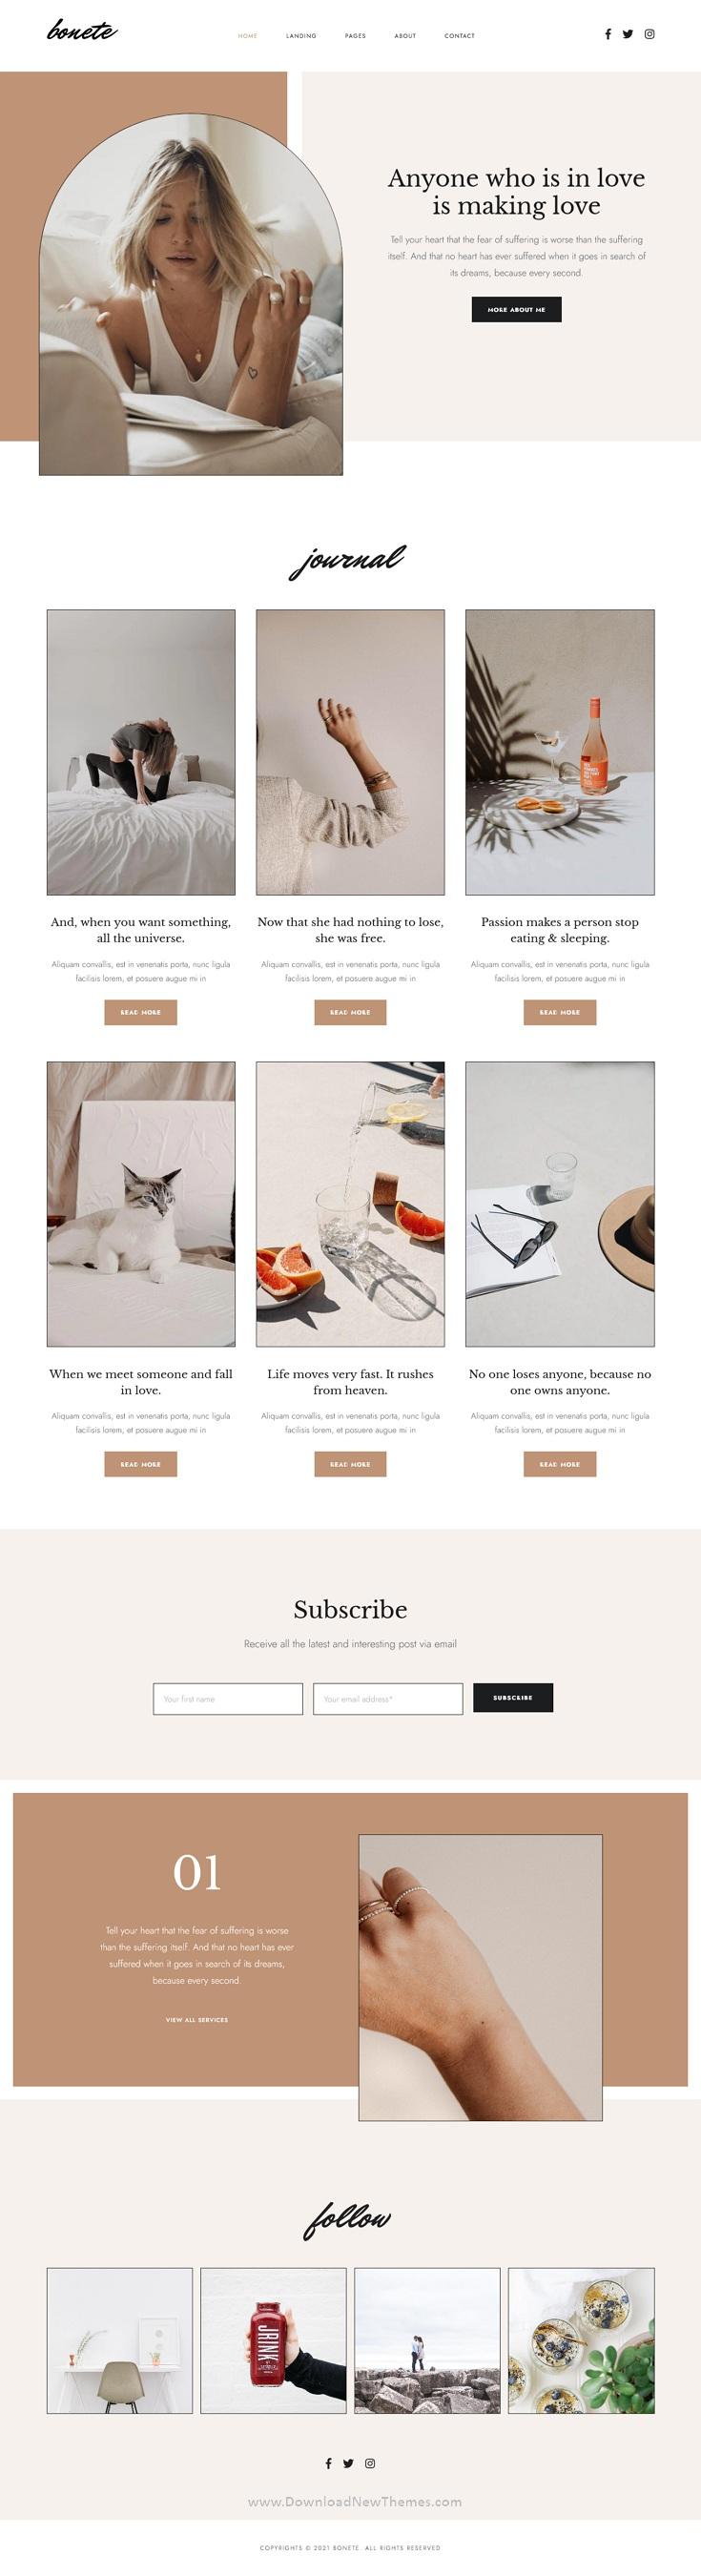 Bonete - Personal Blog HubSpot Theme